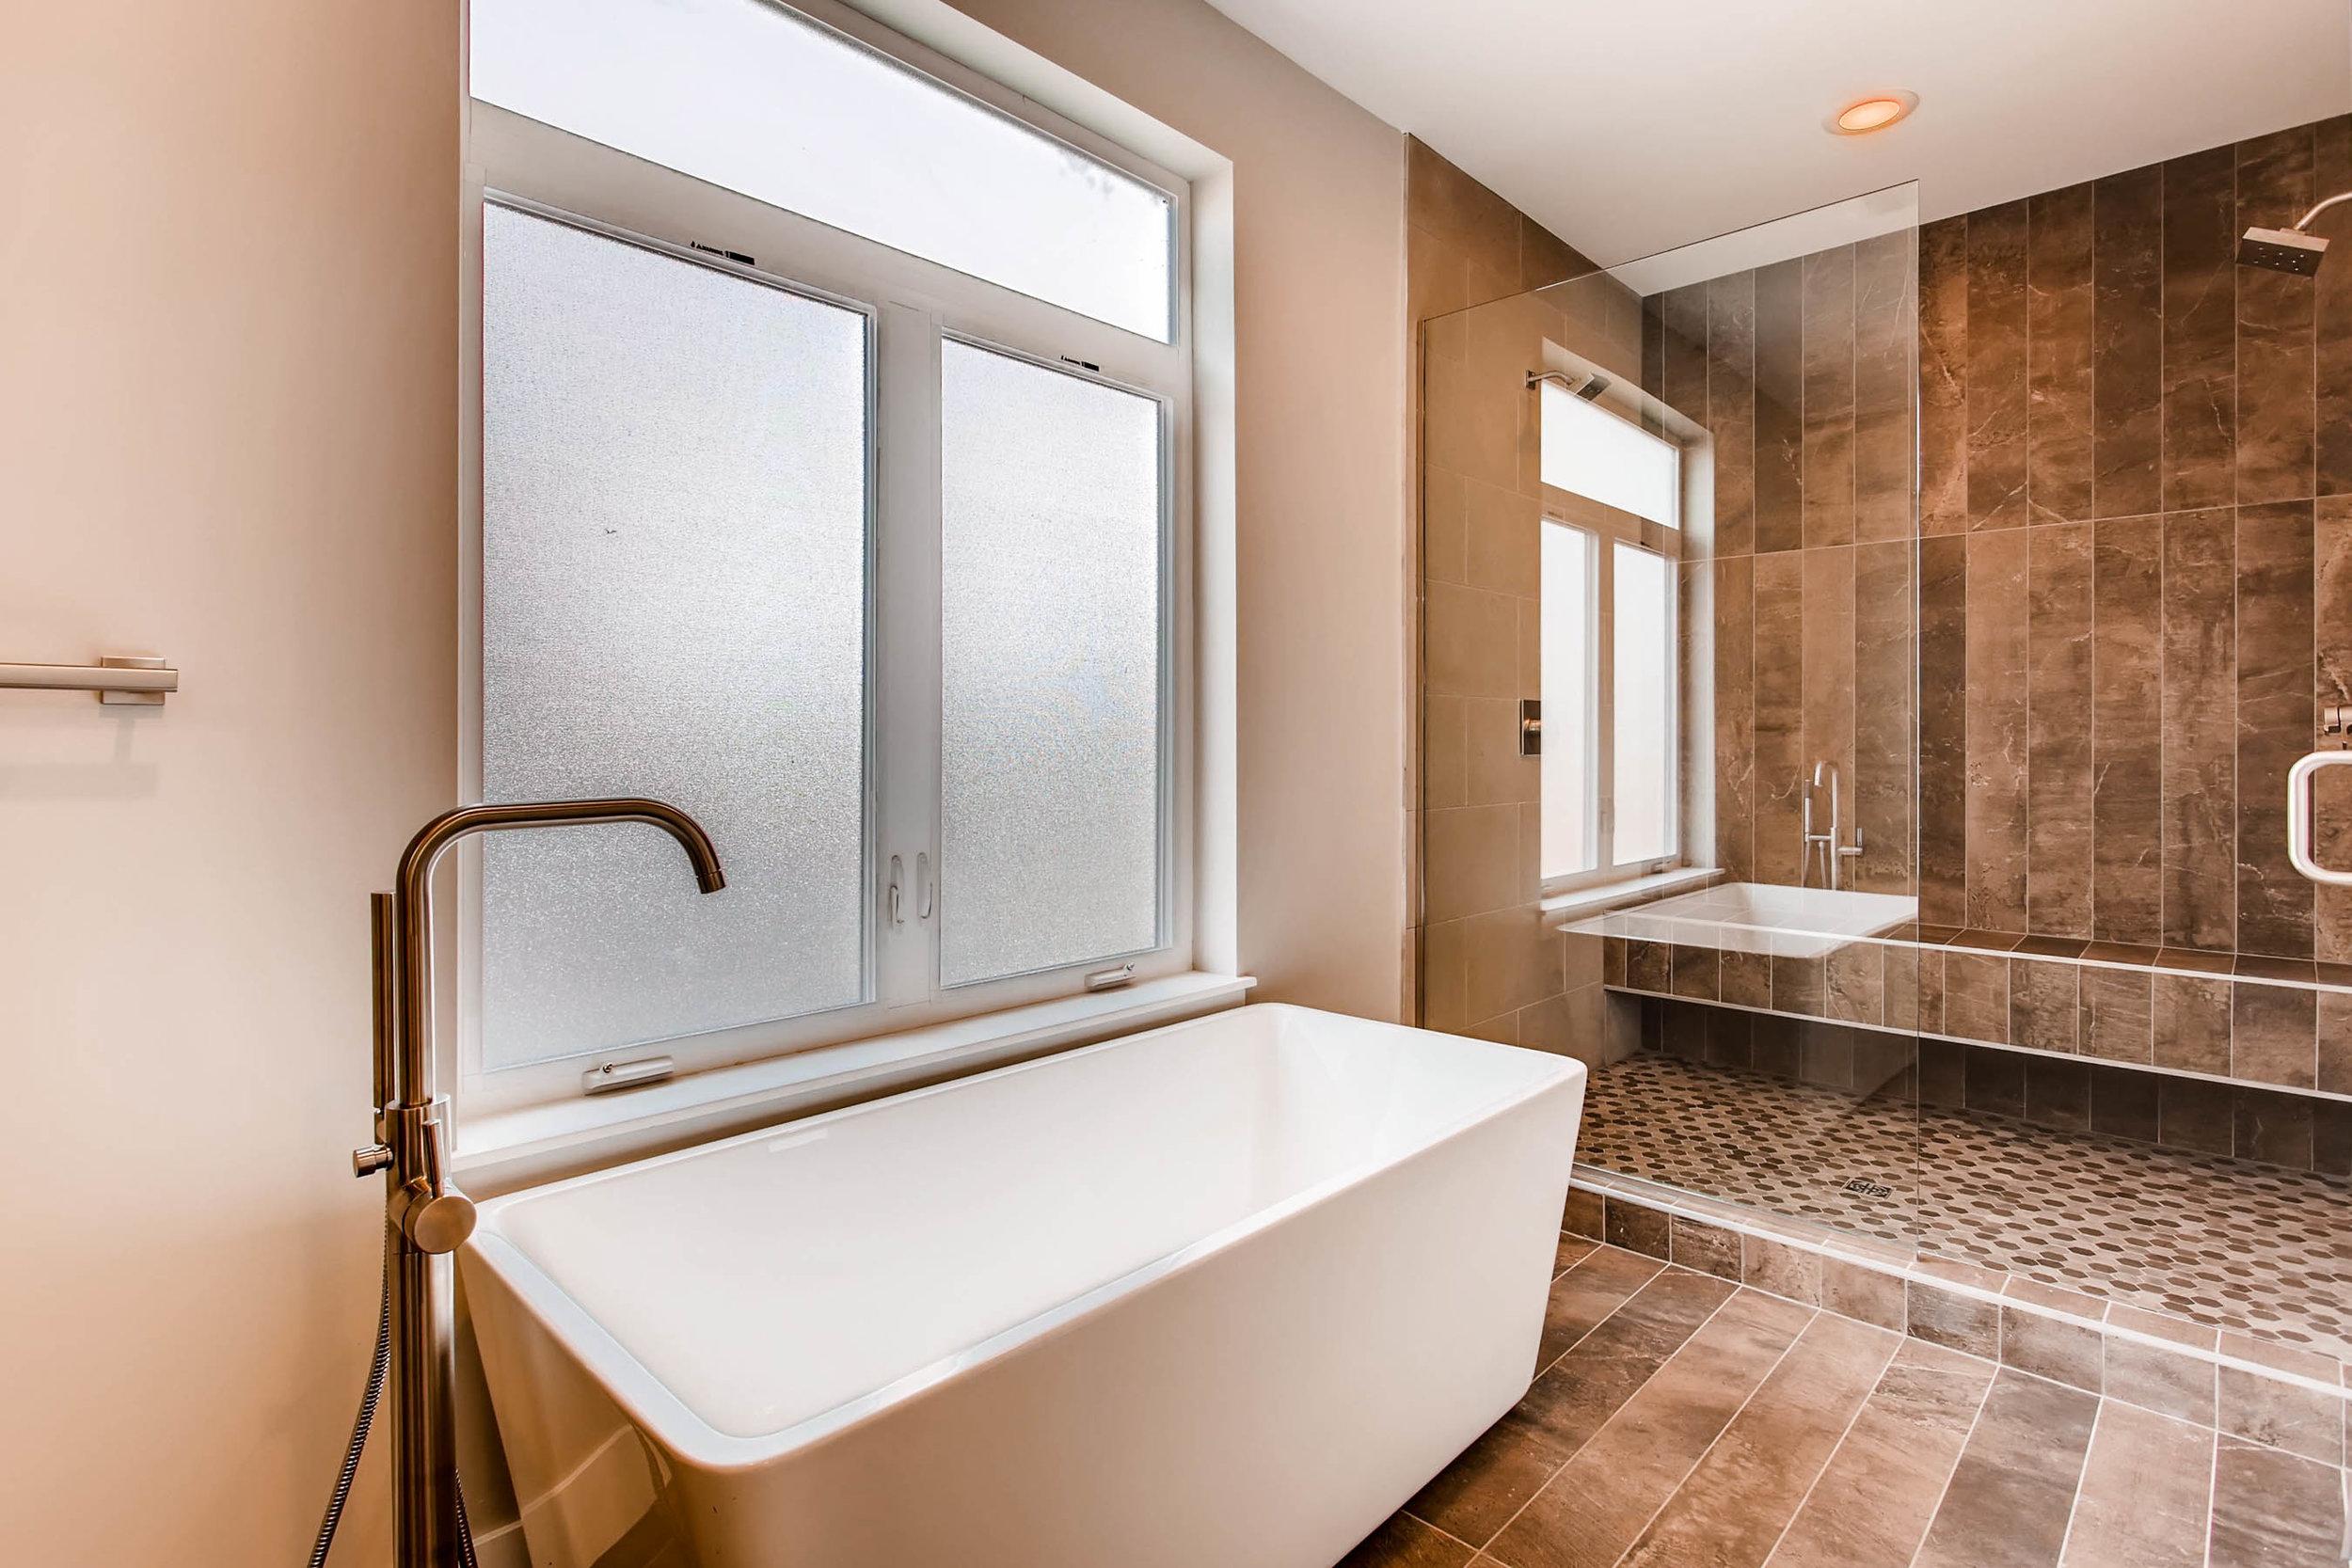 3050 Tennyson Denver CO 80212-print-017-9-2nd Floor Master Bathroom-2700x1800-300dpi.jpg